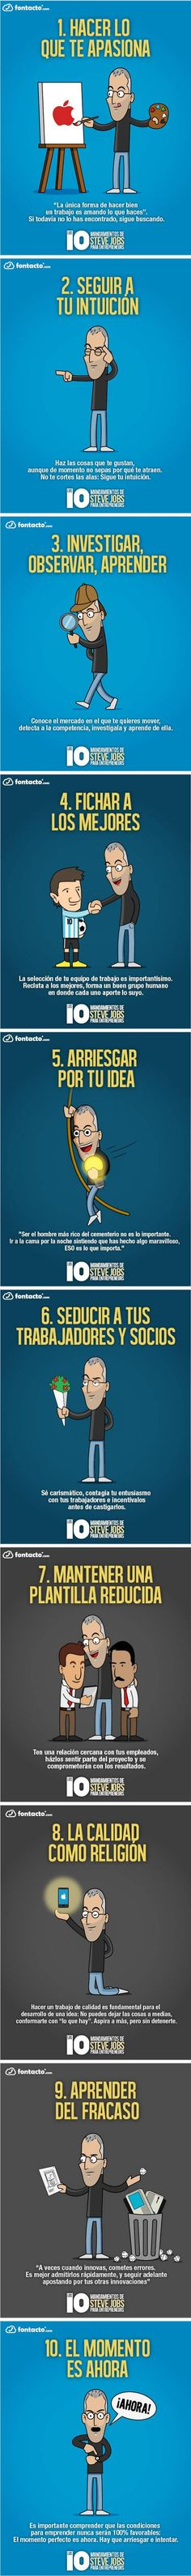 Los diez mandamientos de Steve Jobs para emprendedores #infografia